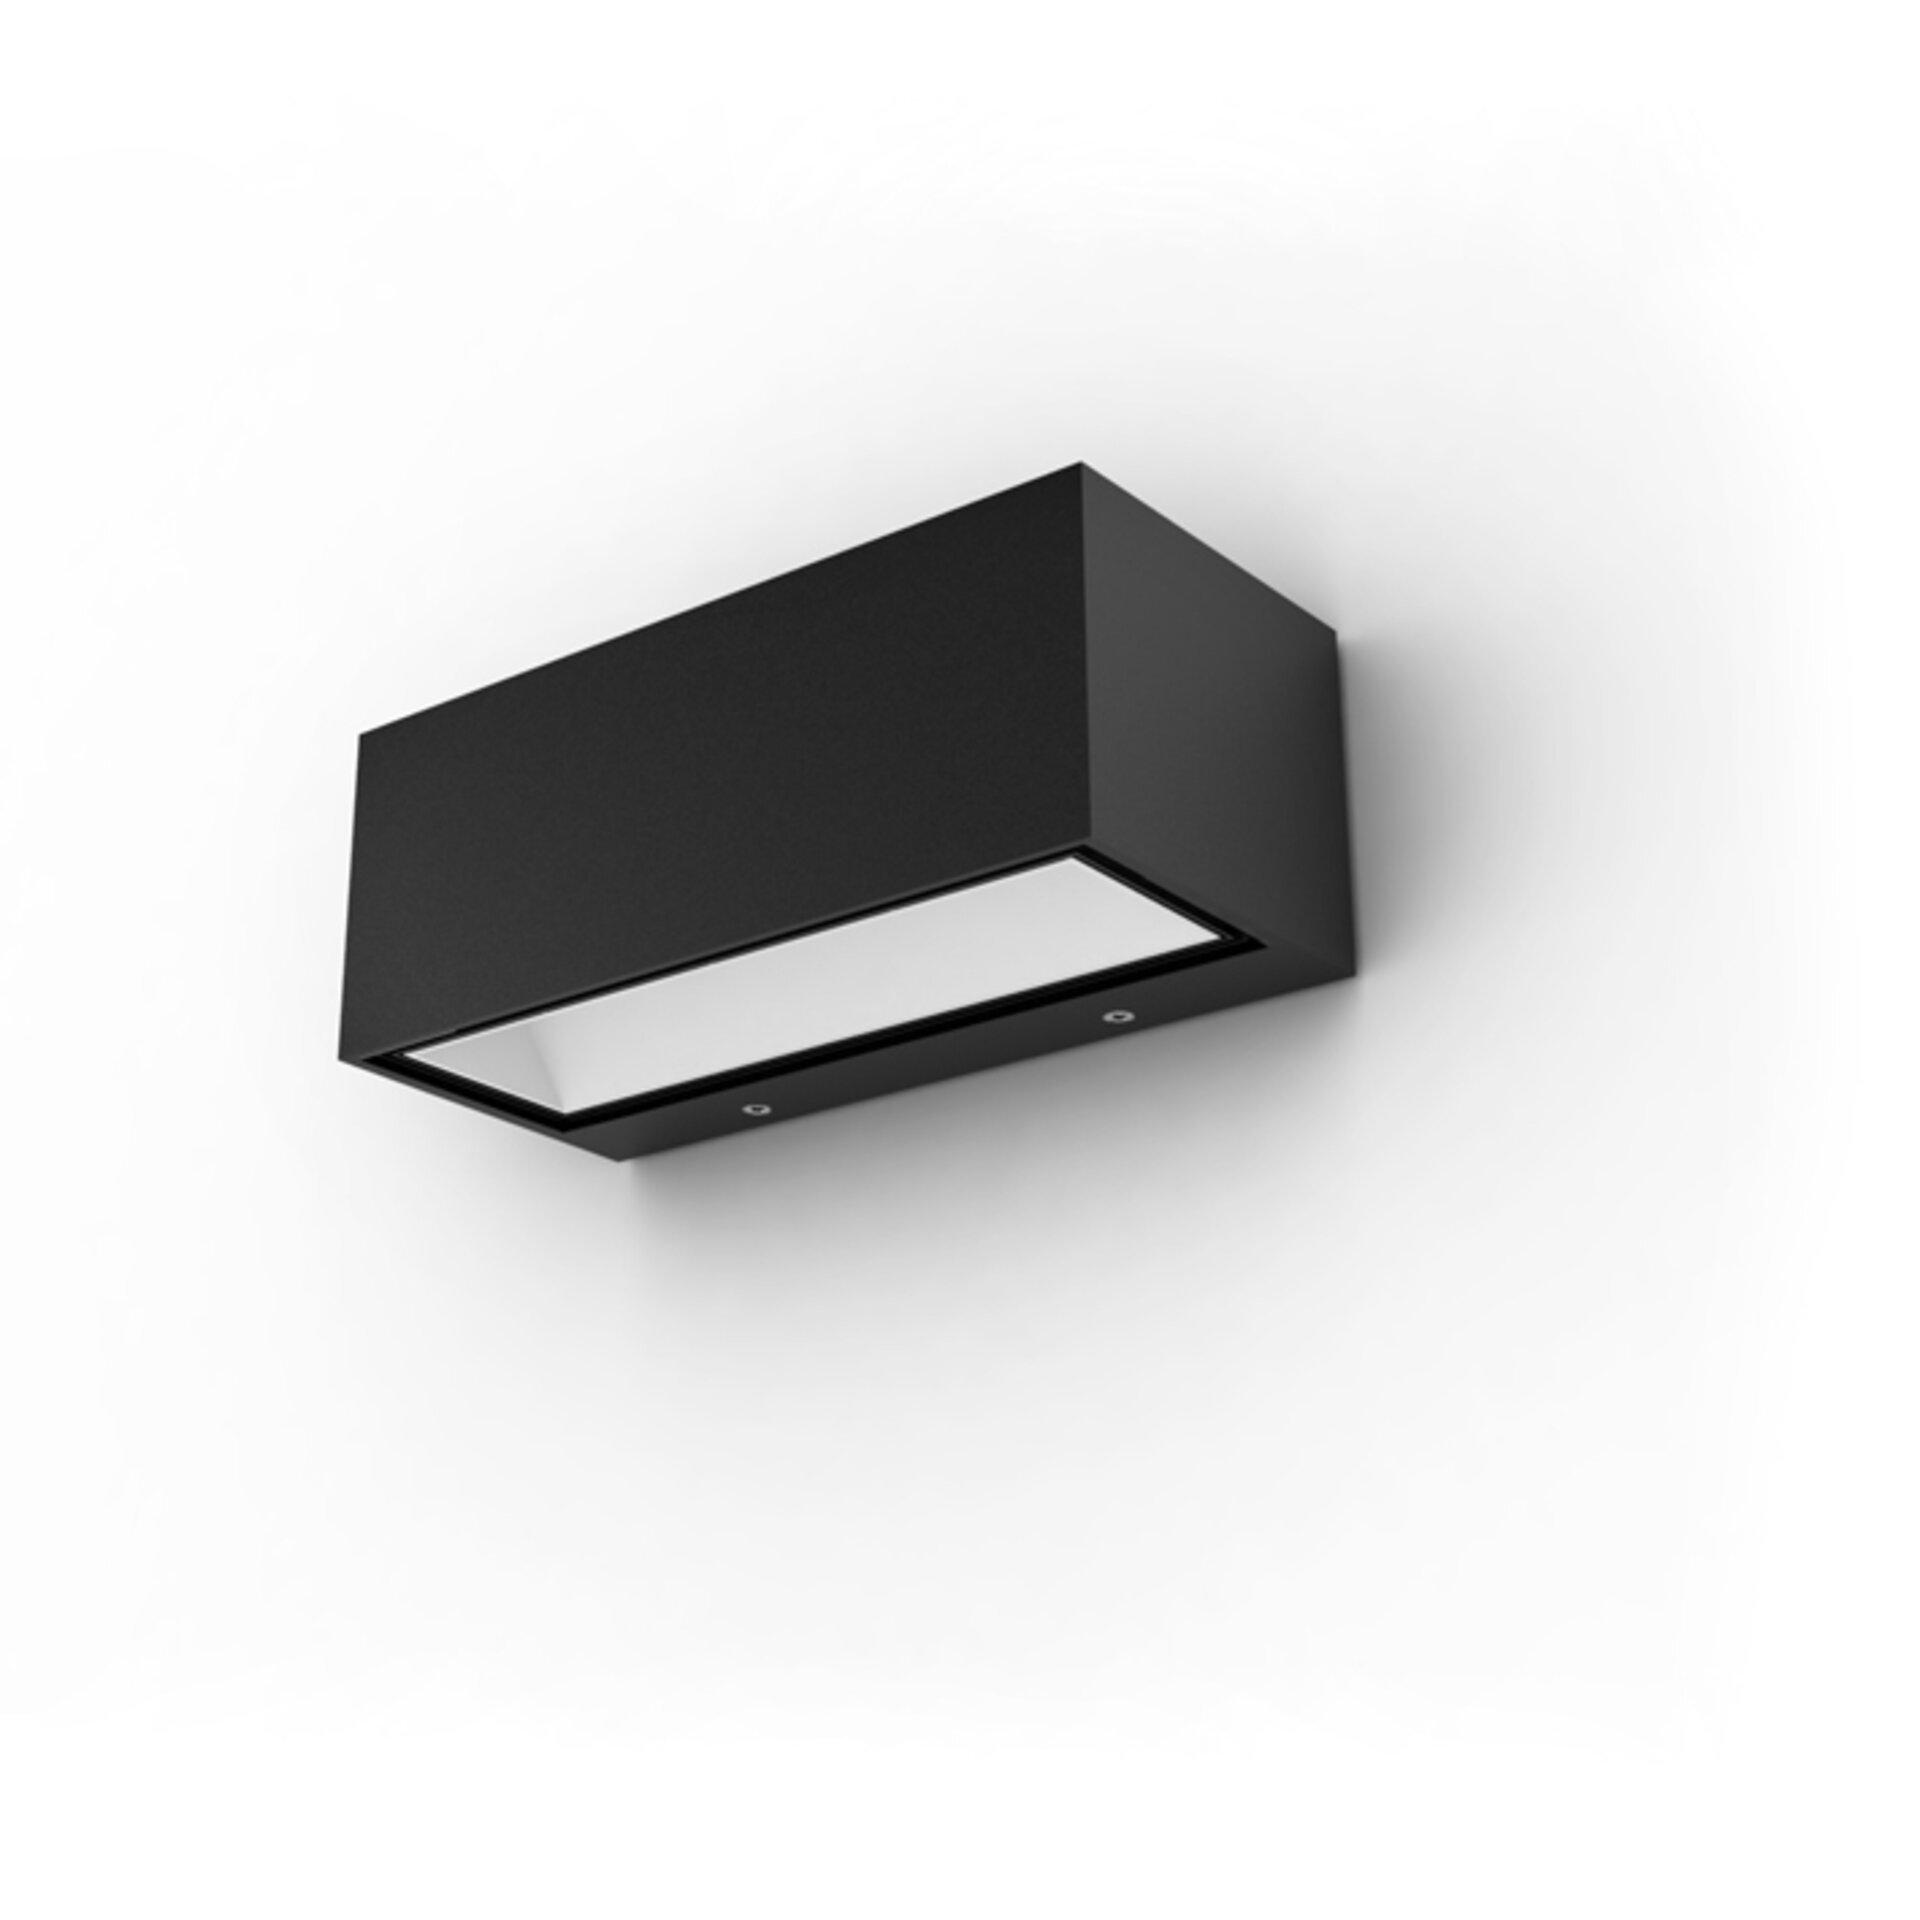 Wand-Aussenleuchte Gemini Eco-Light Metall grau 22 x 9 x 10 cm